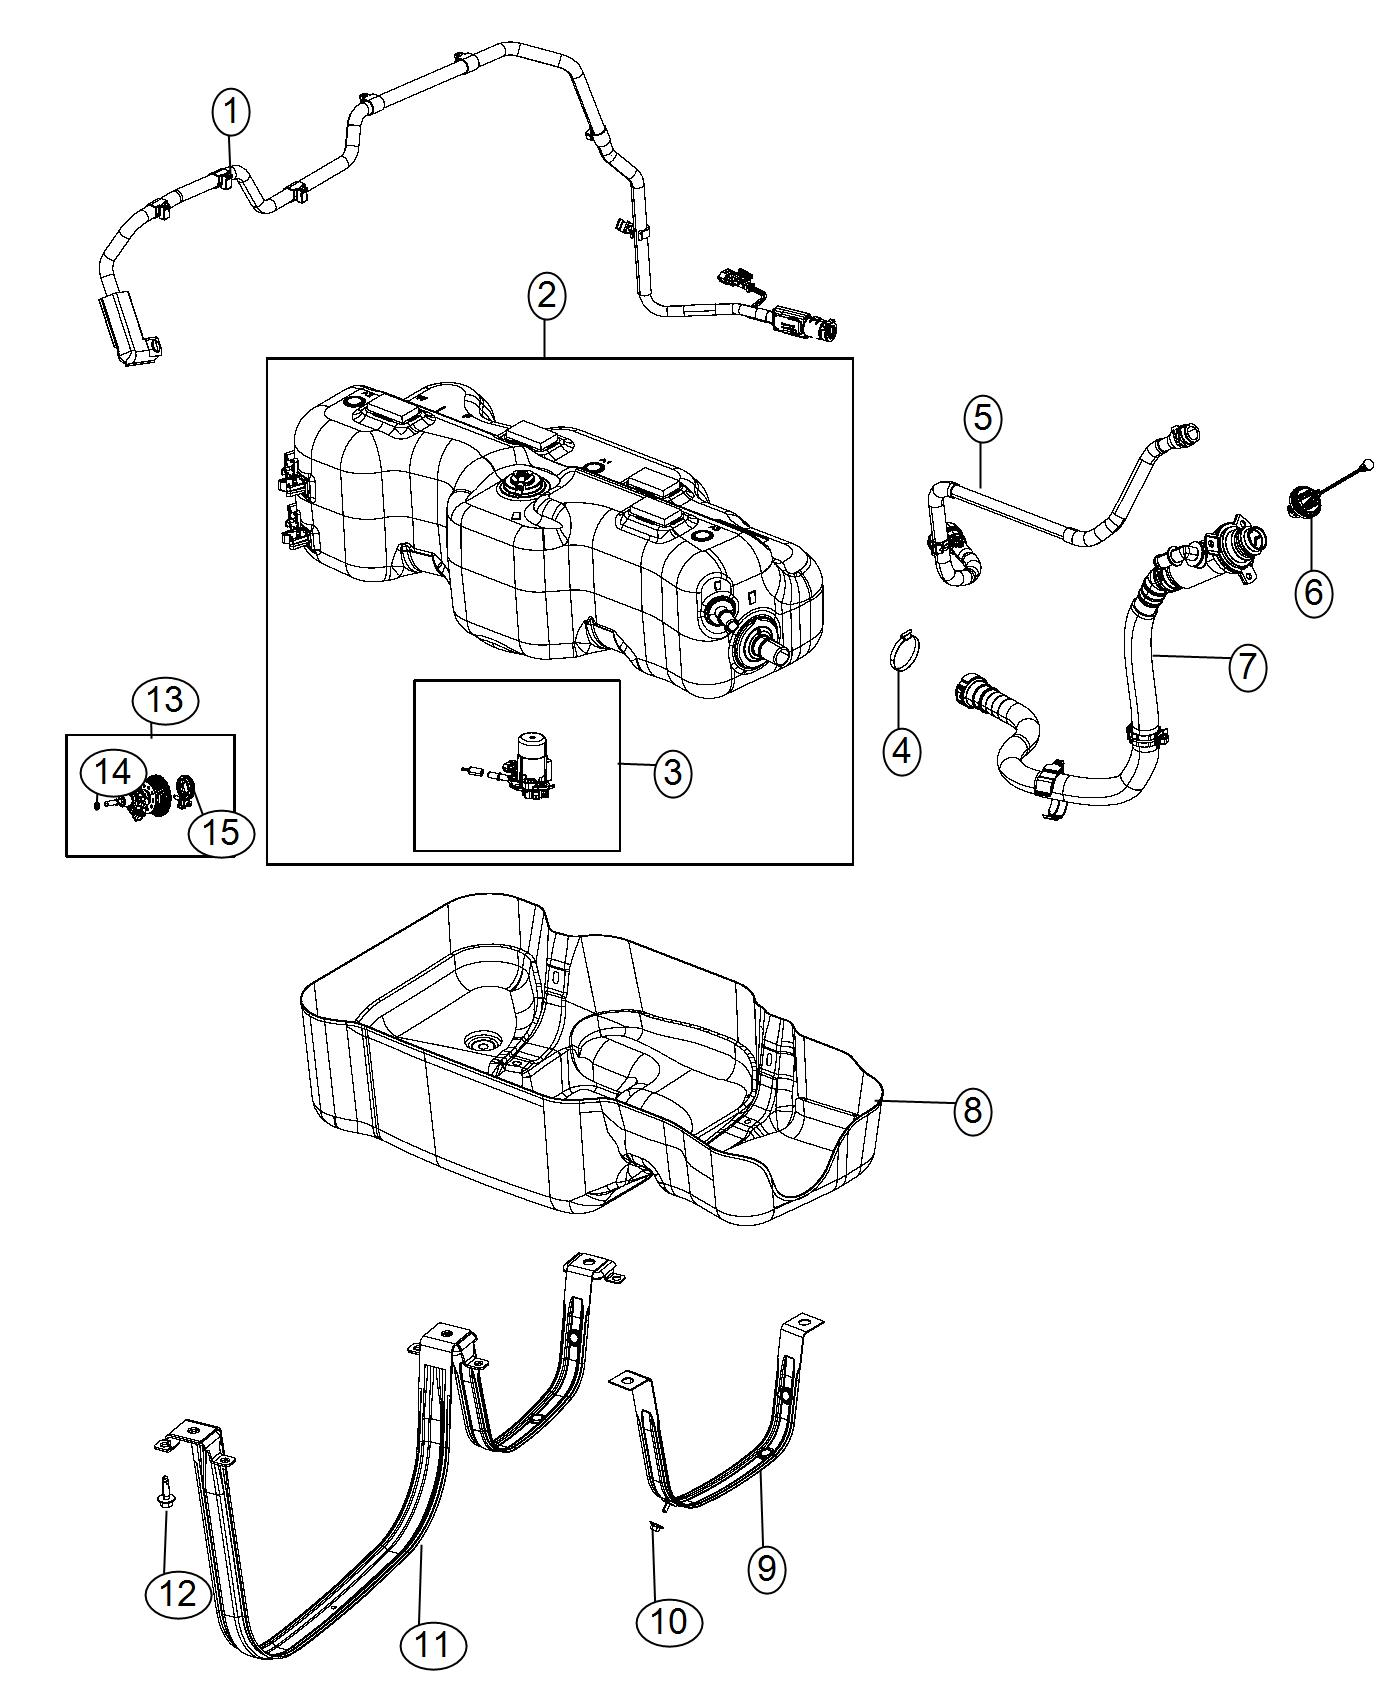 Ram Tubesel Exhaust Fluid Supply